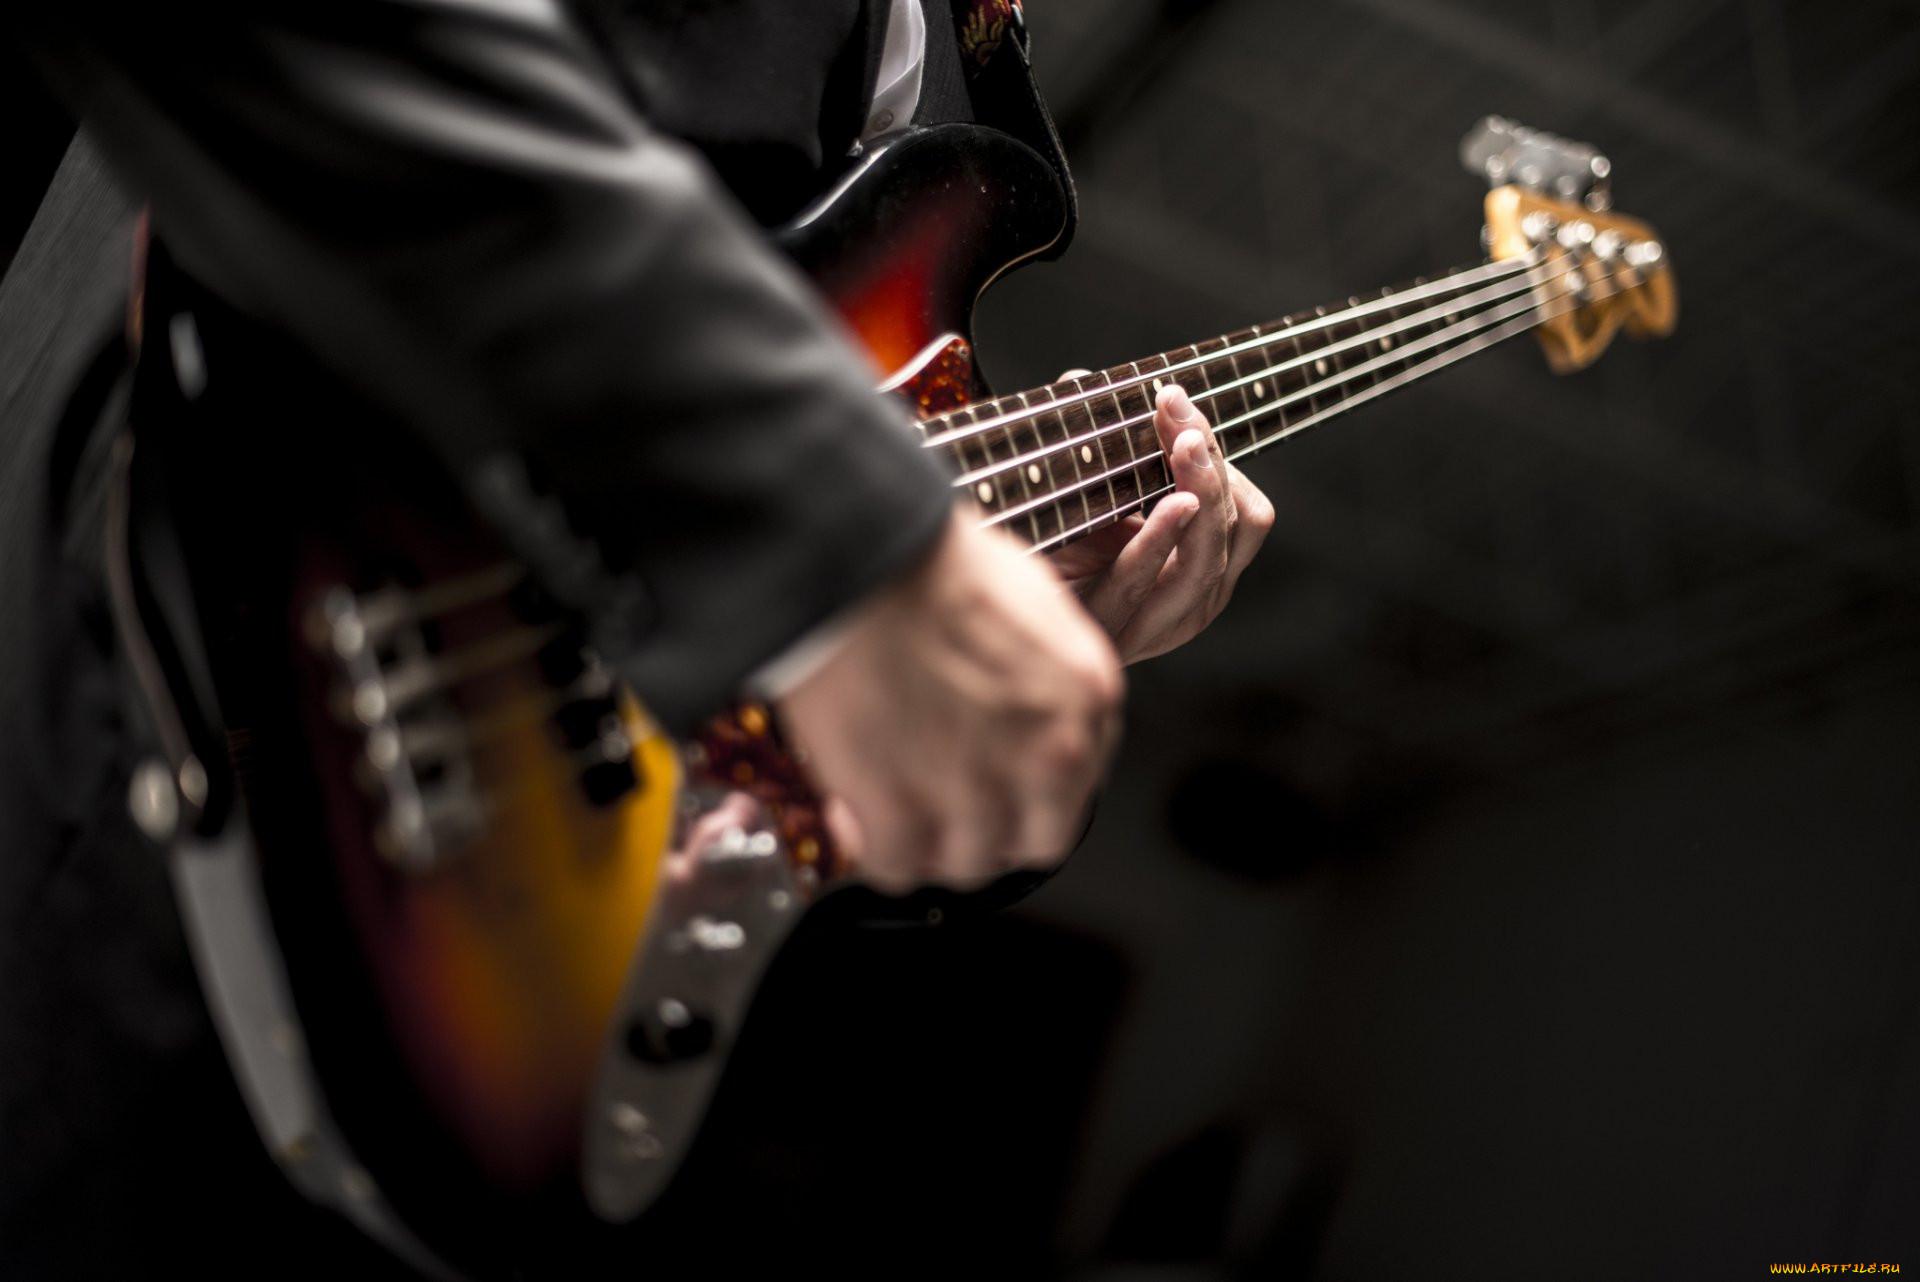 картинки гитар и гитаристов вашу заявку